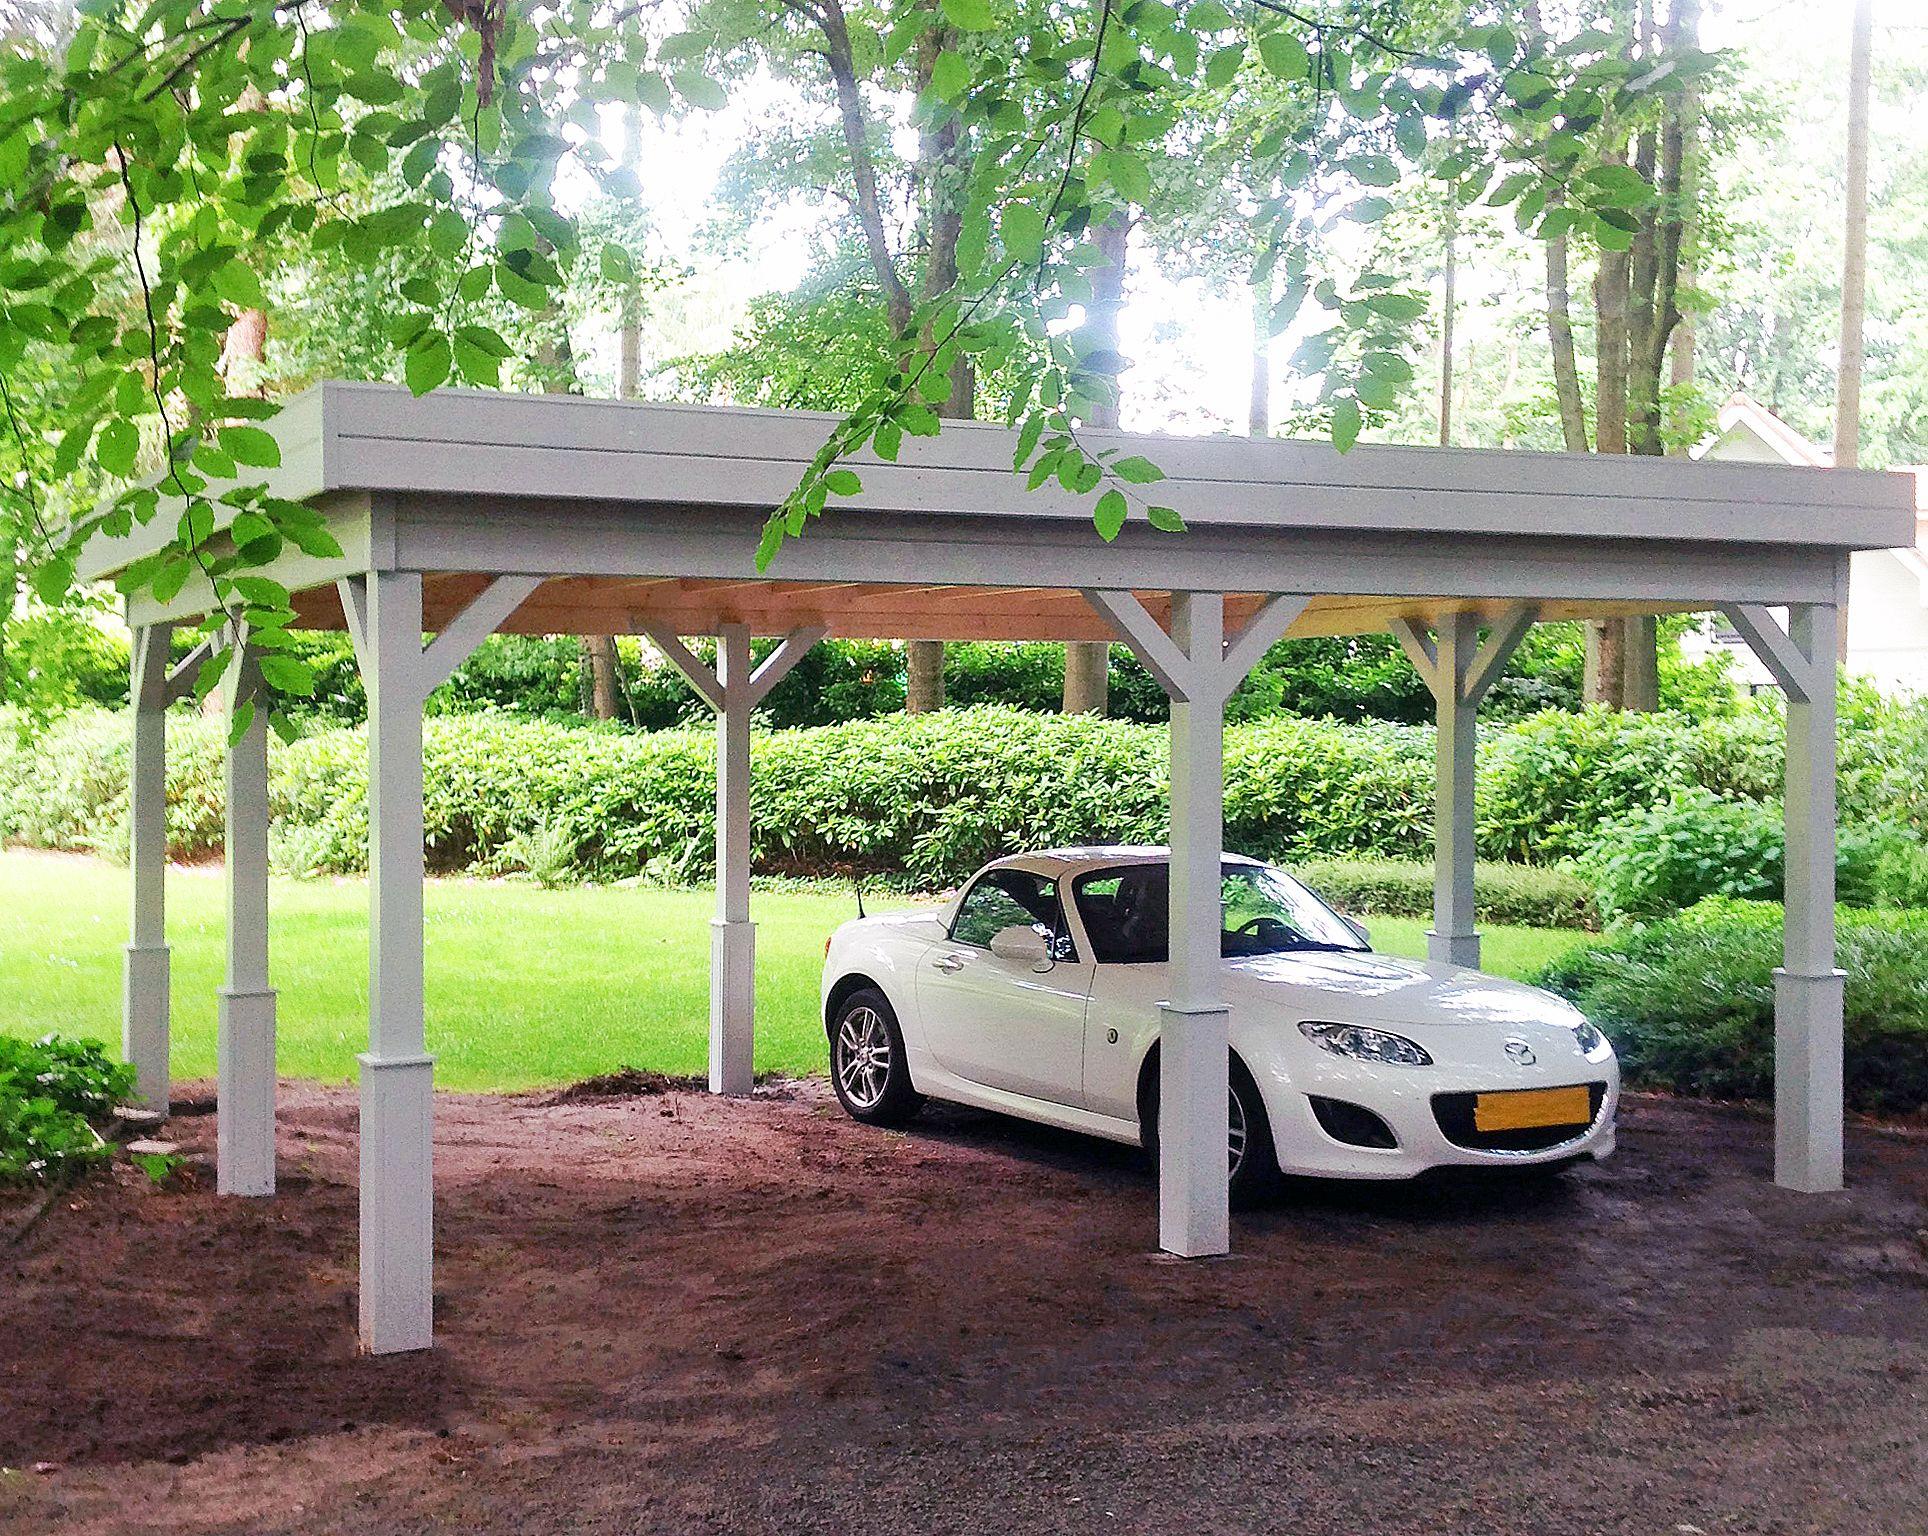 Houten Garage Topkwaliteit garages sinds 1978 Carport